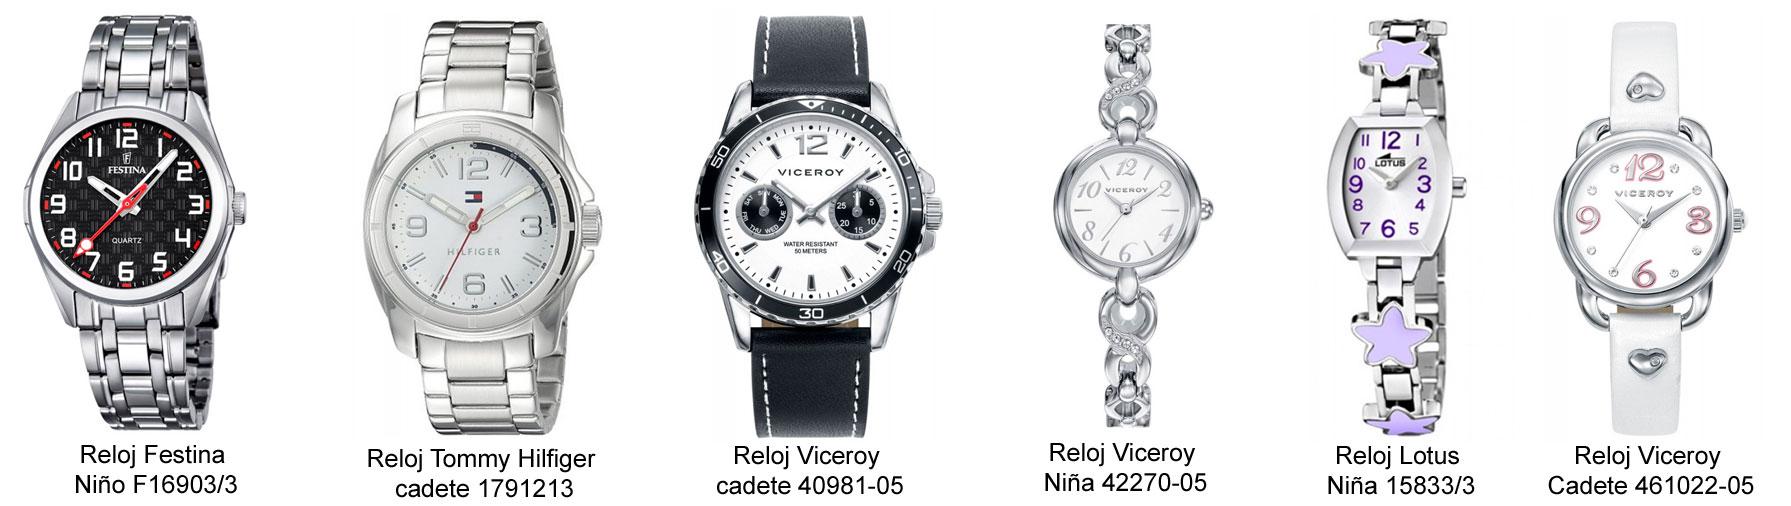 304bca6ede4c relojes-niños-elegantes